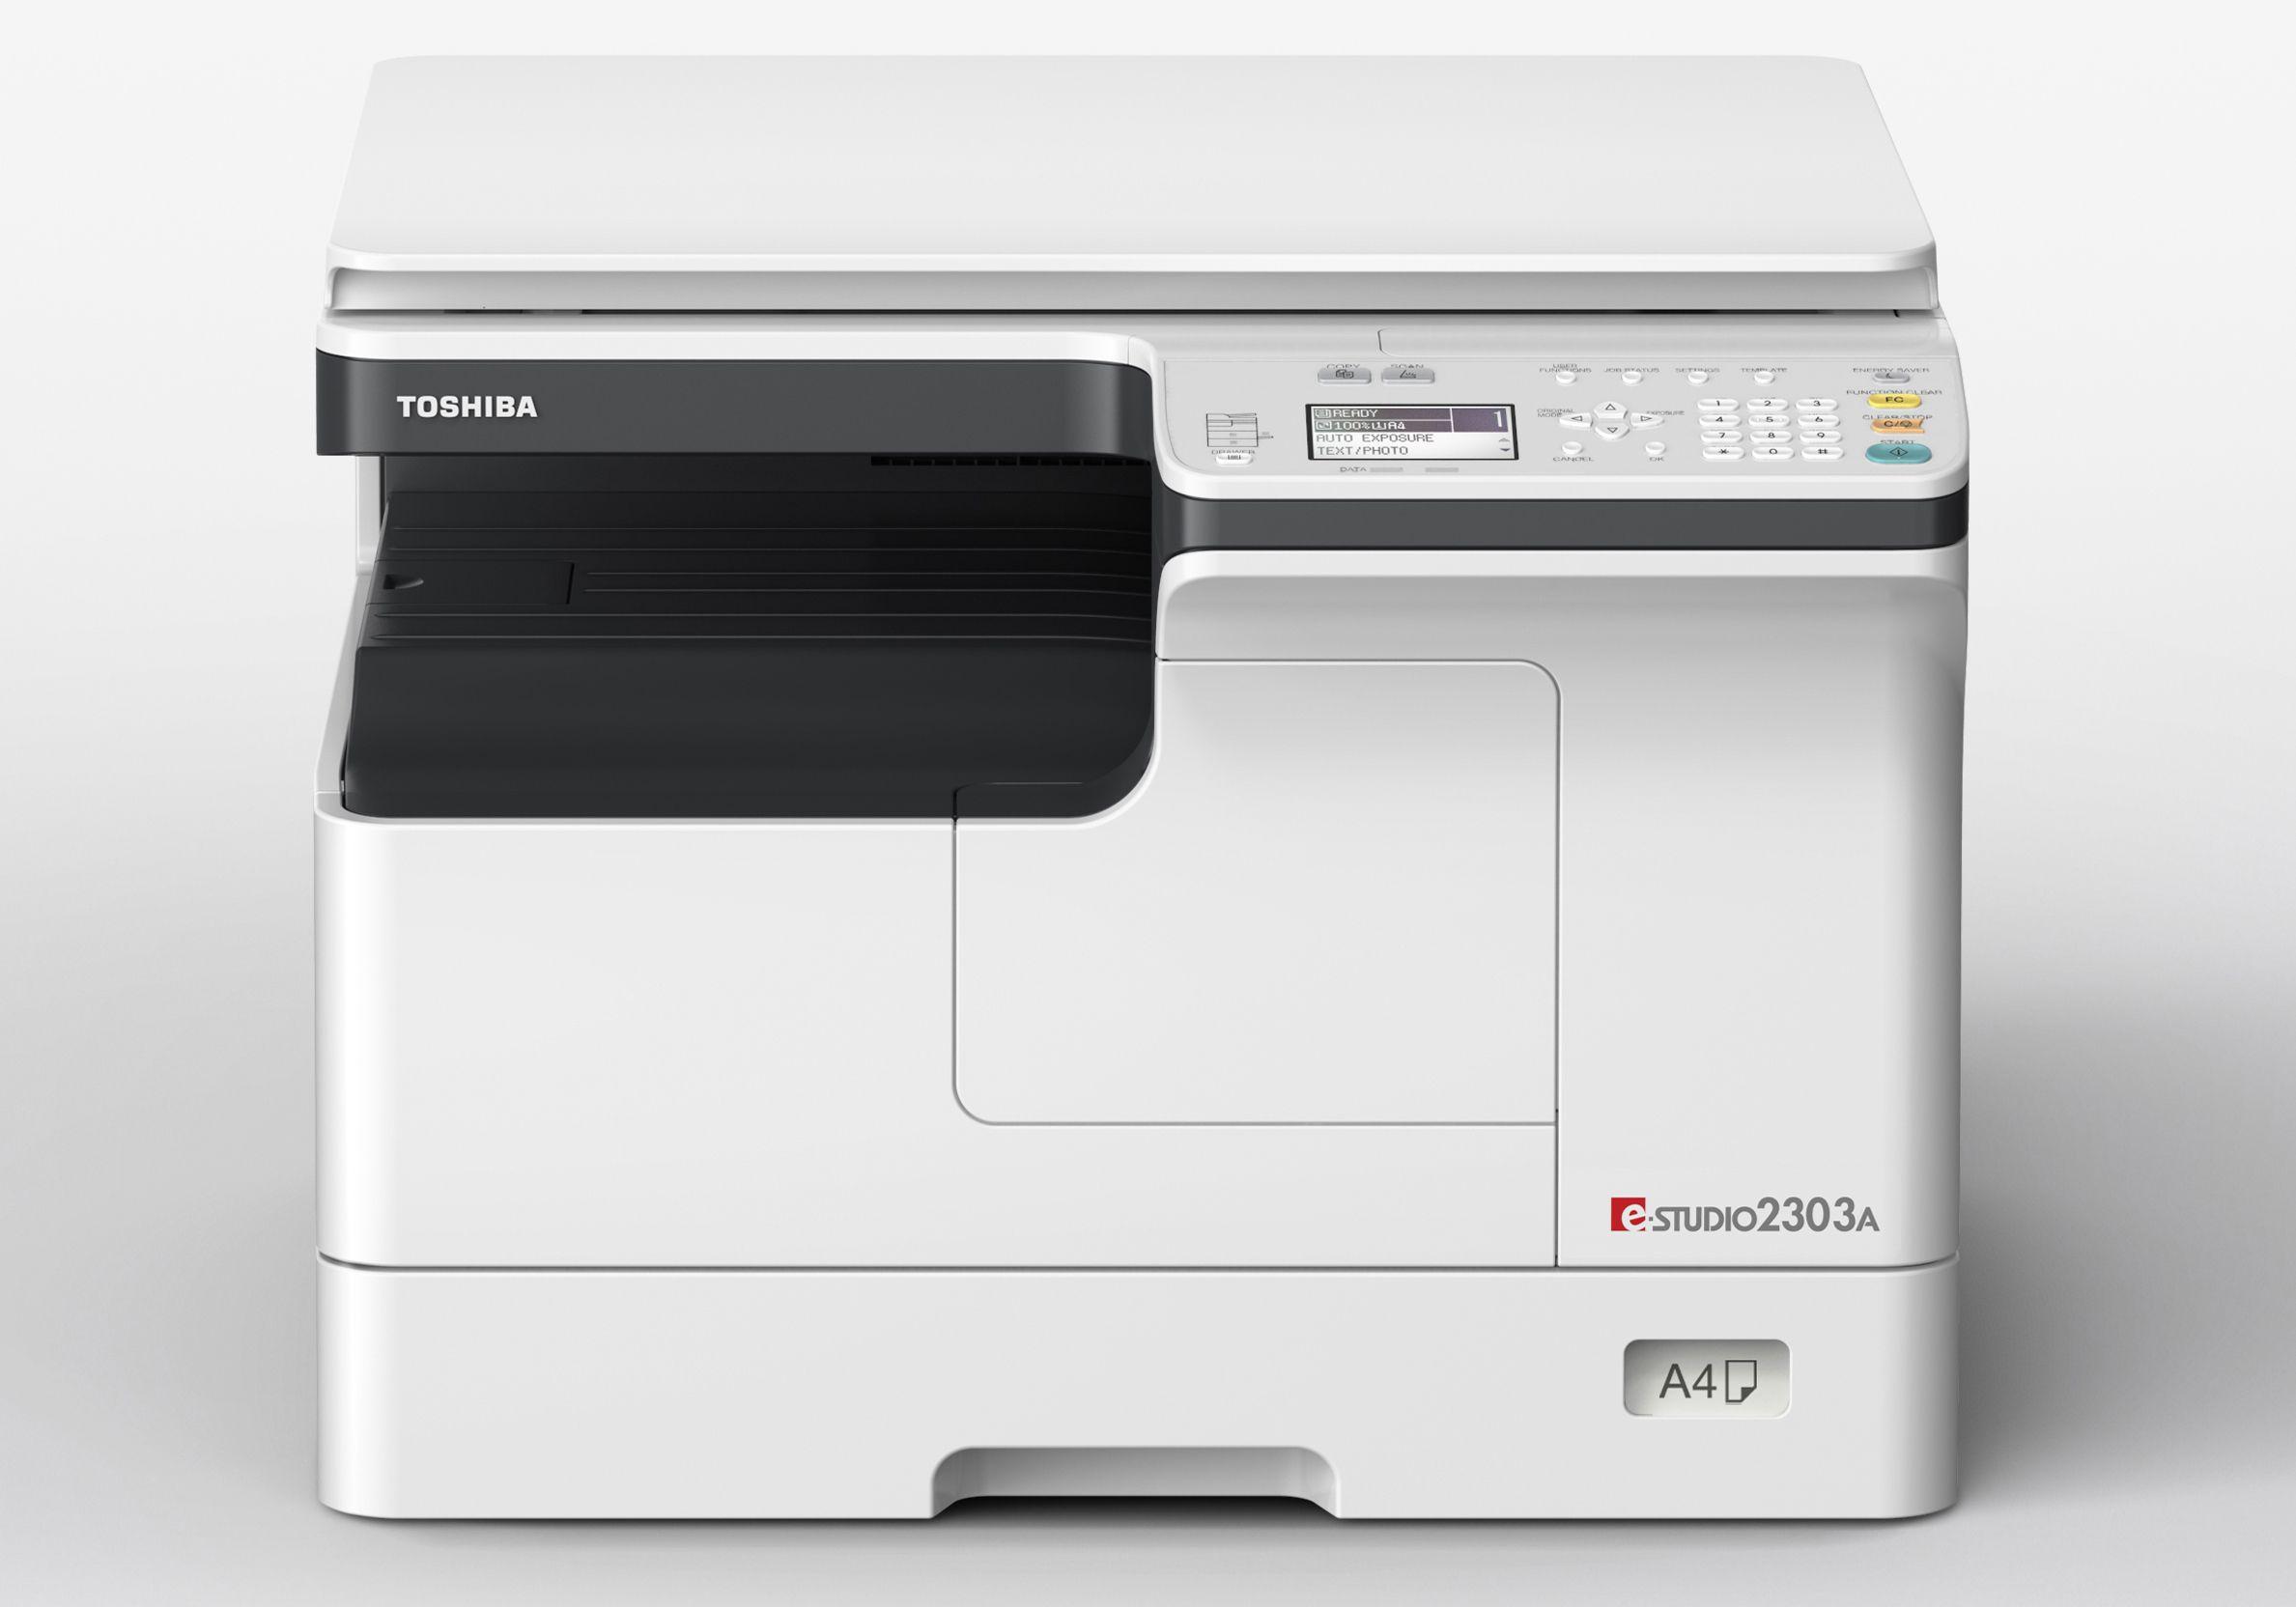 Photocopier Price In Bangladesh Digital Toshiba Machine